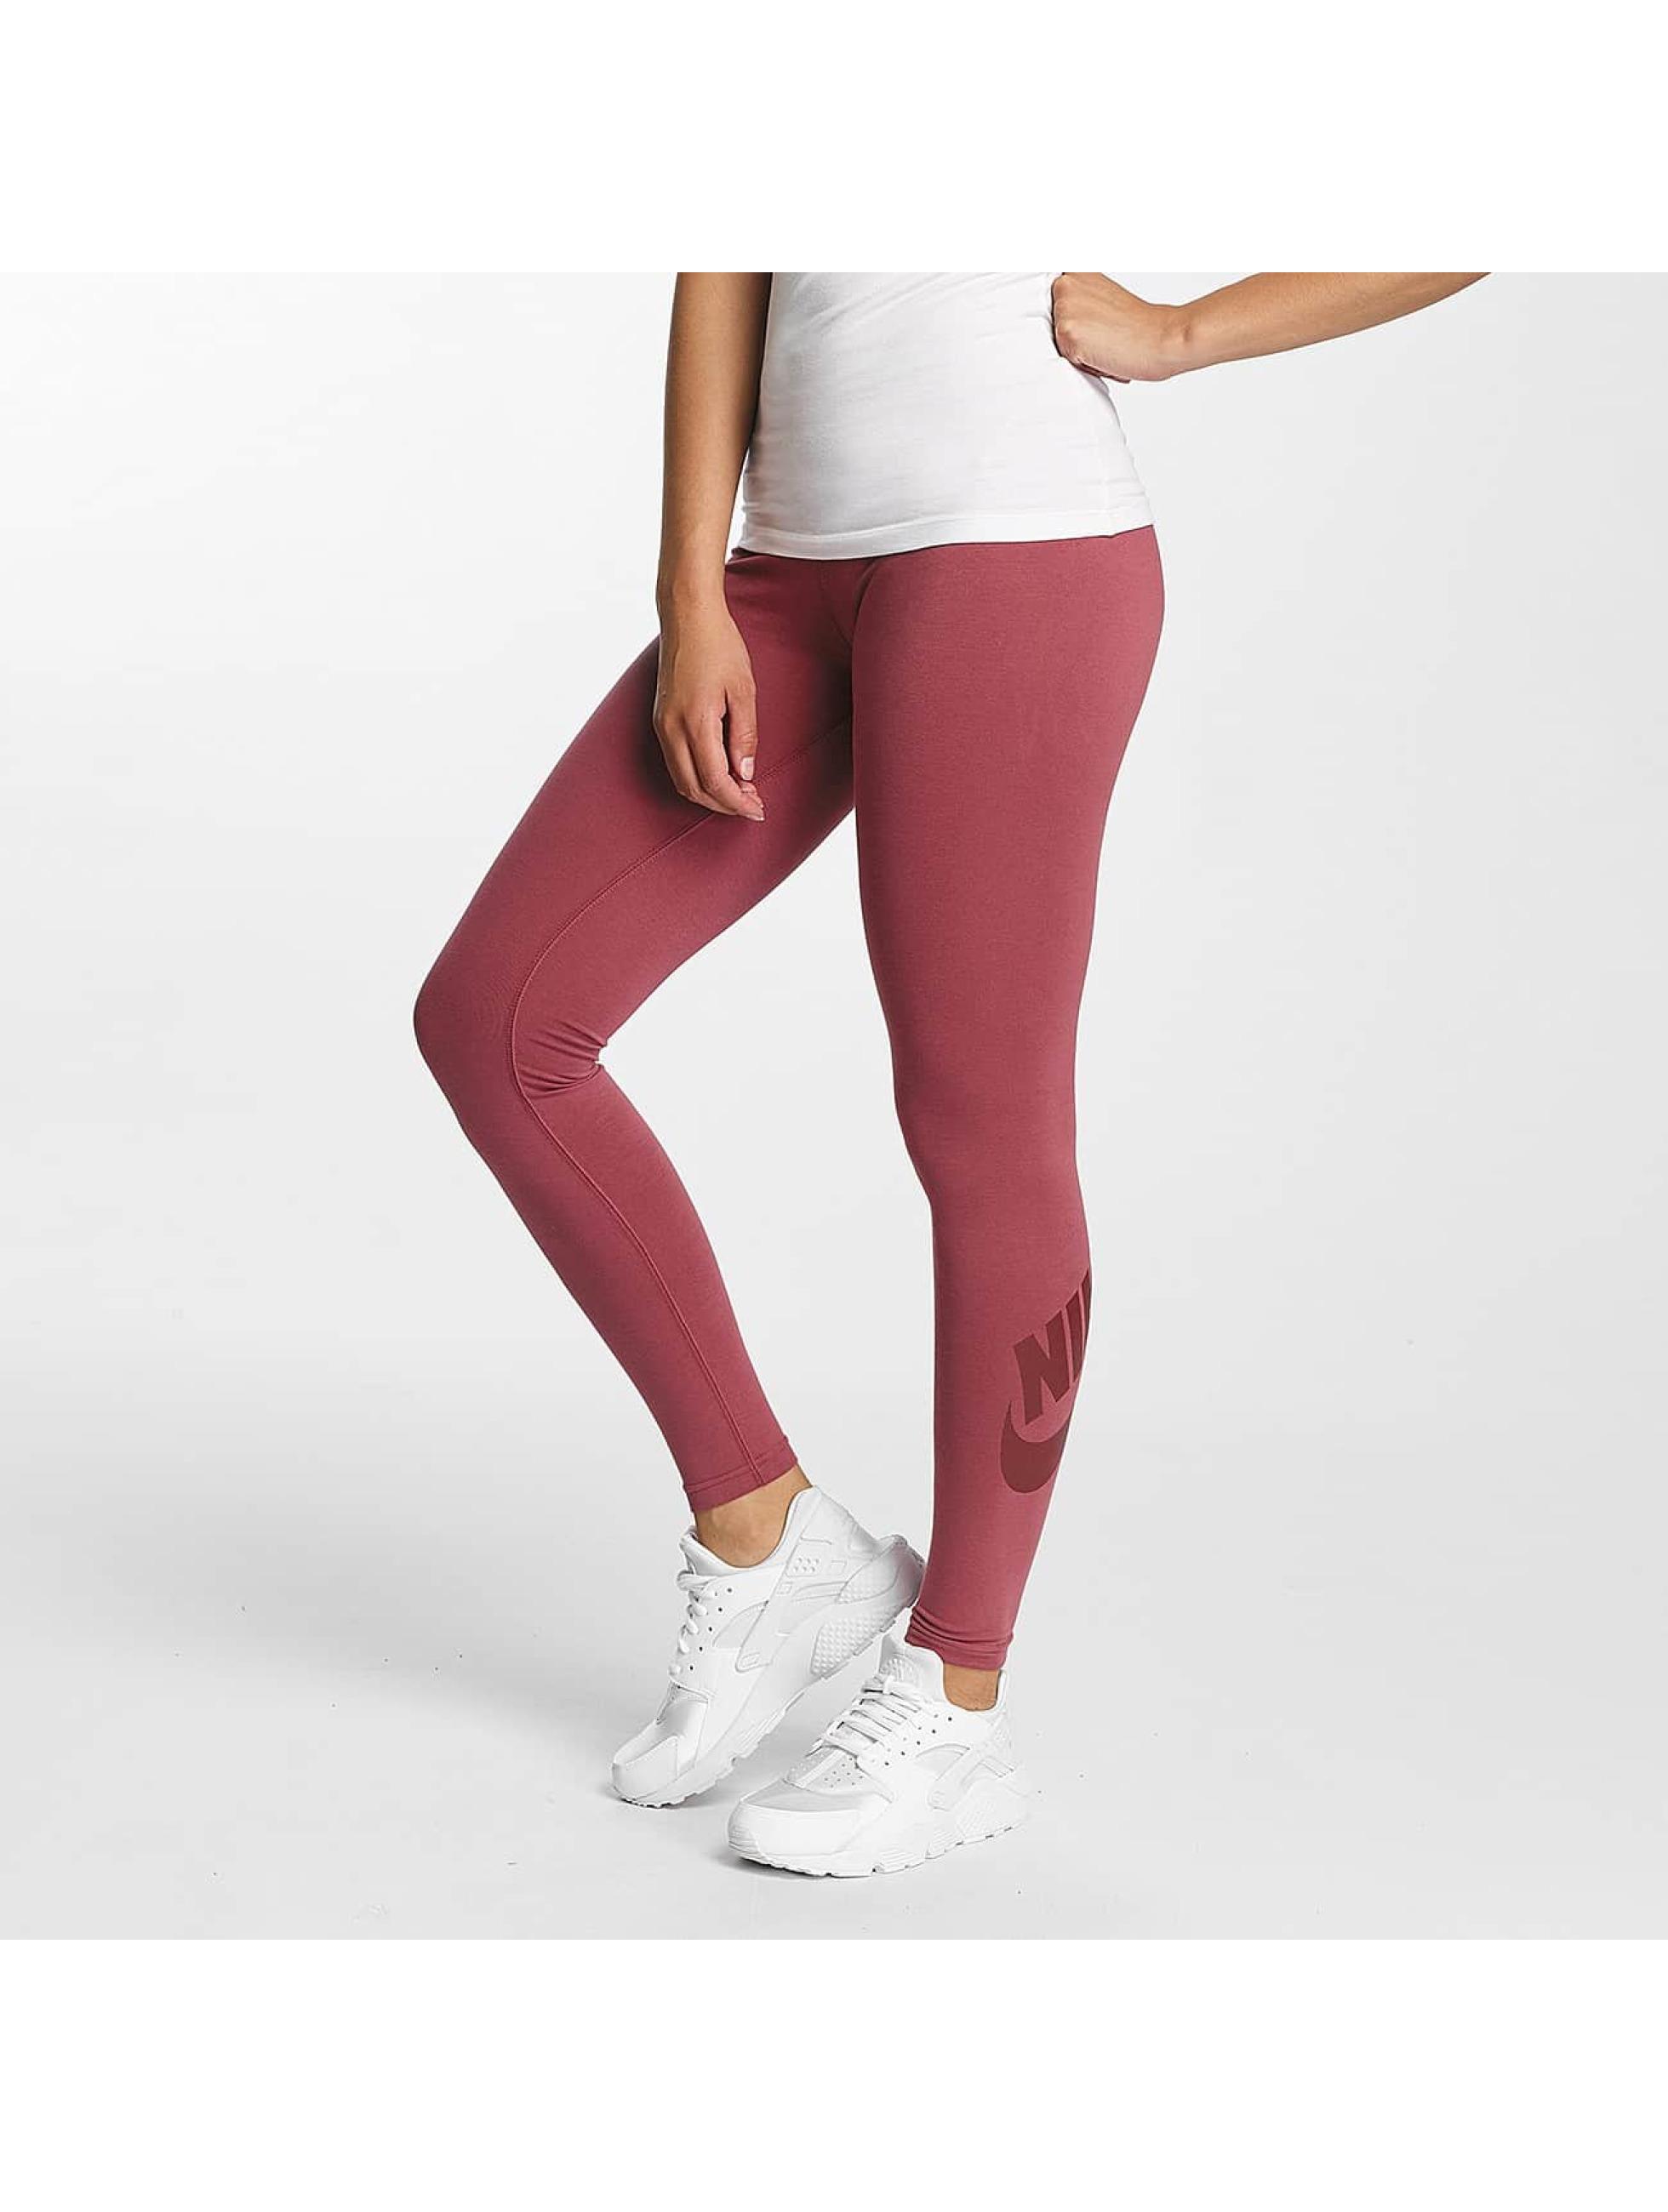 Nike Frauen Legging Leg-A-See Logo in rot